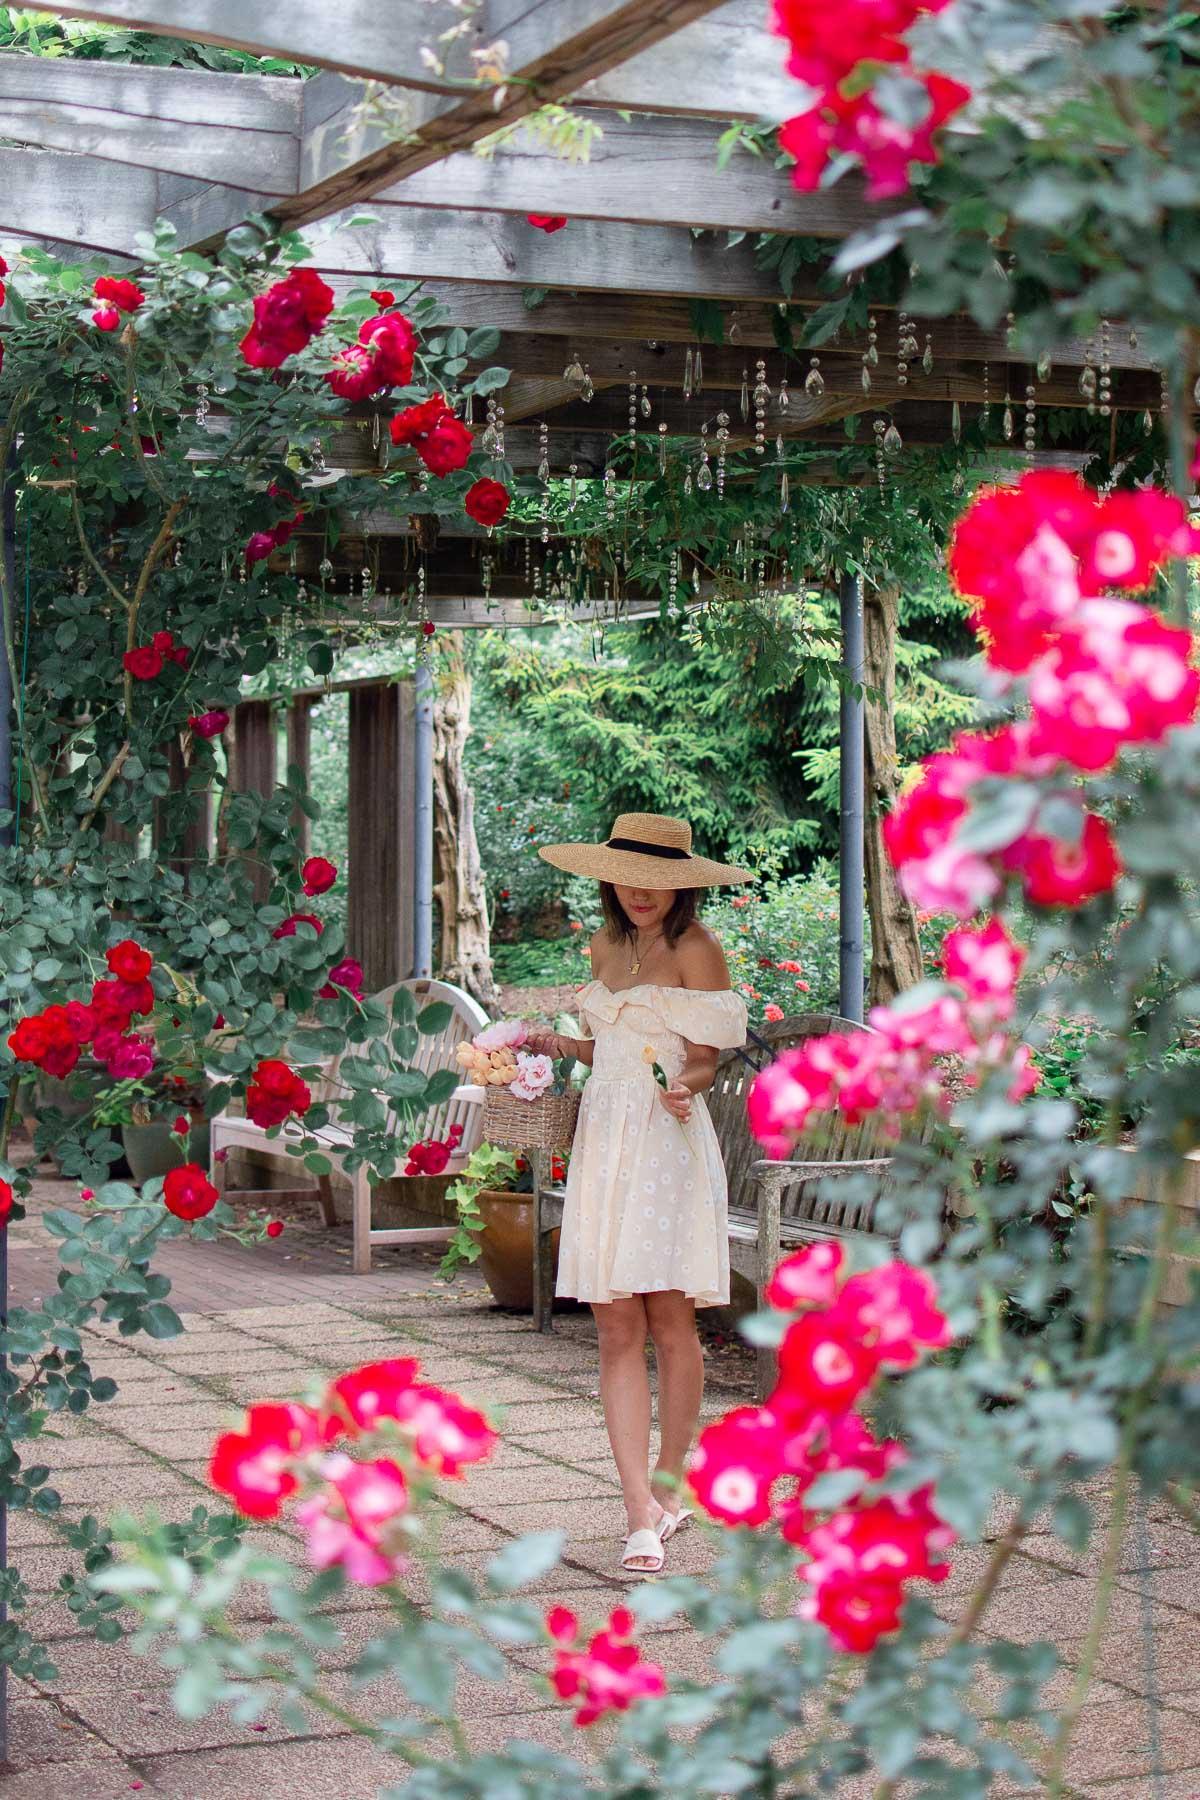 brookside rose arbor